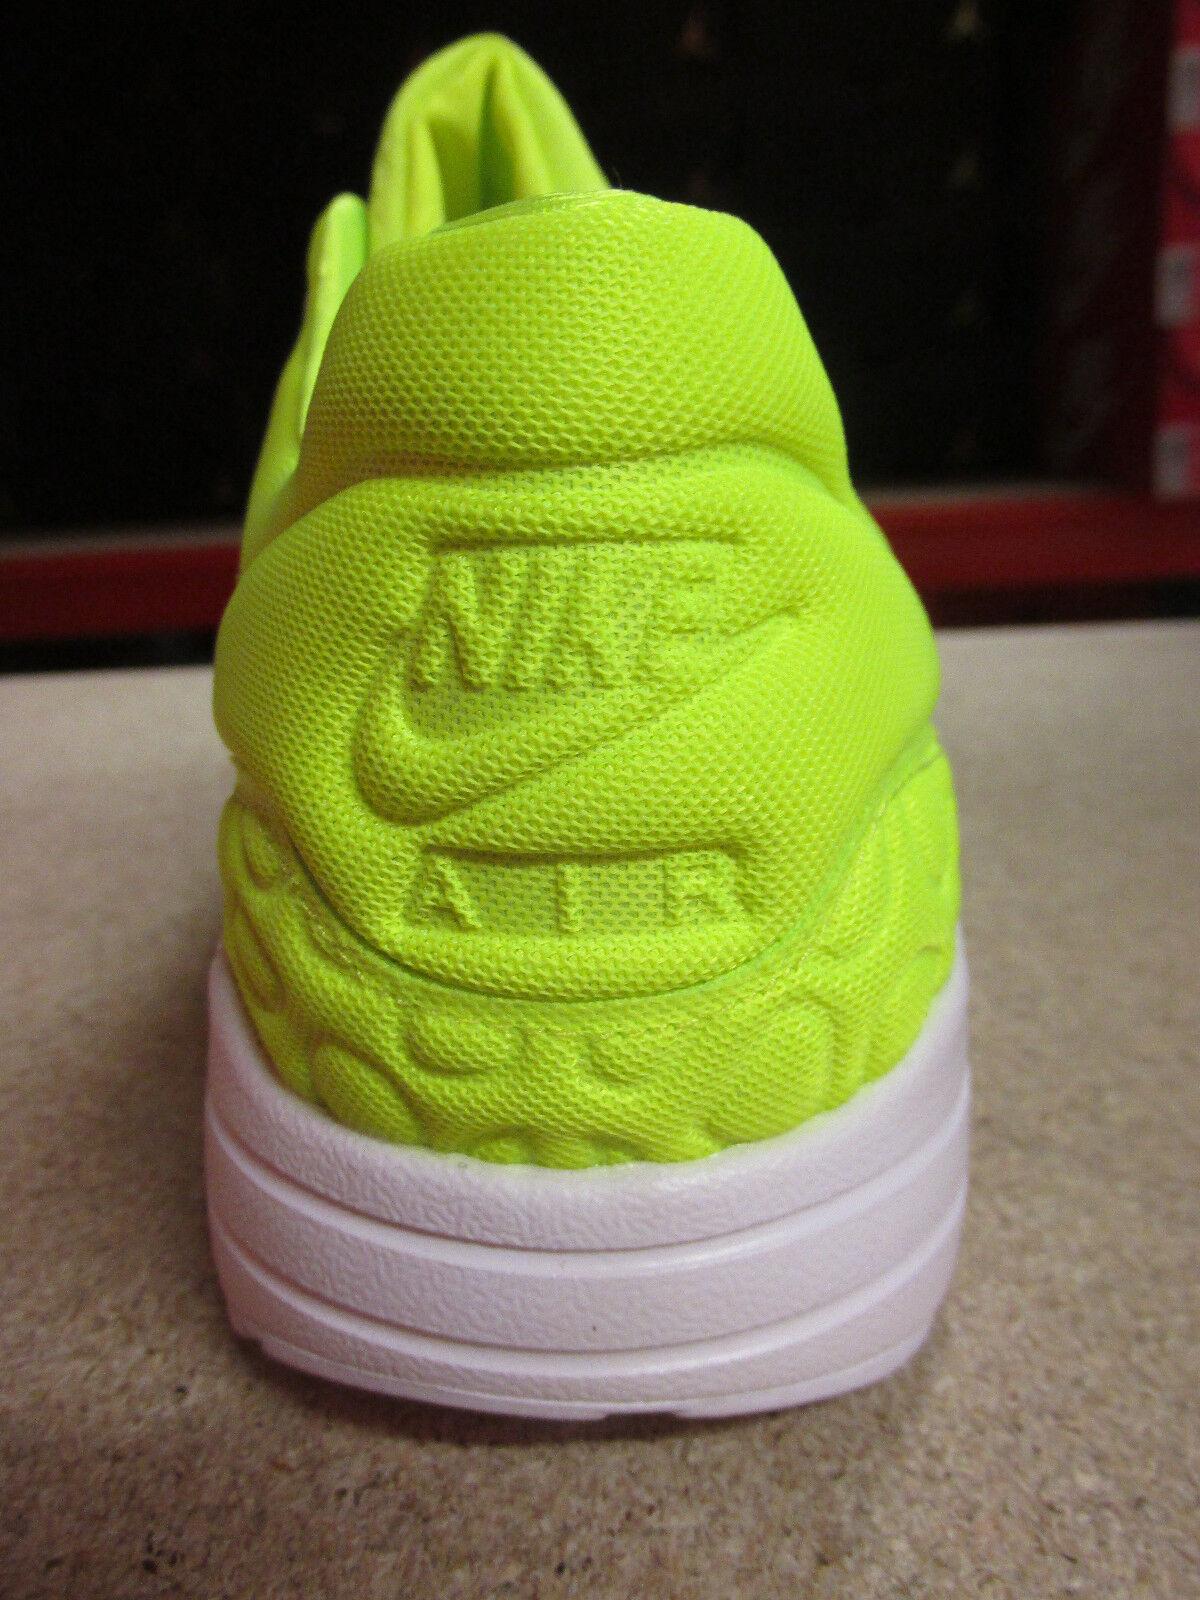 nike air max 1 ultra felpa donna scarpe scarpe da corsa 844882 700 scarpe scarpe da tennis 0ab28b